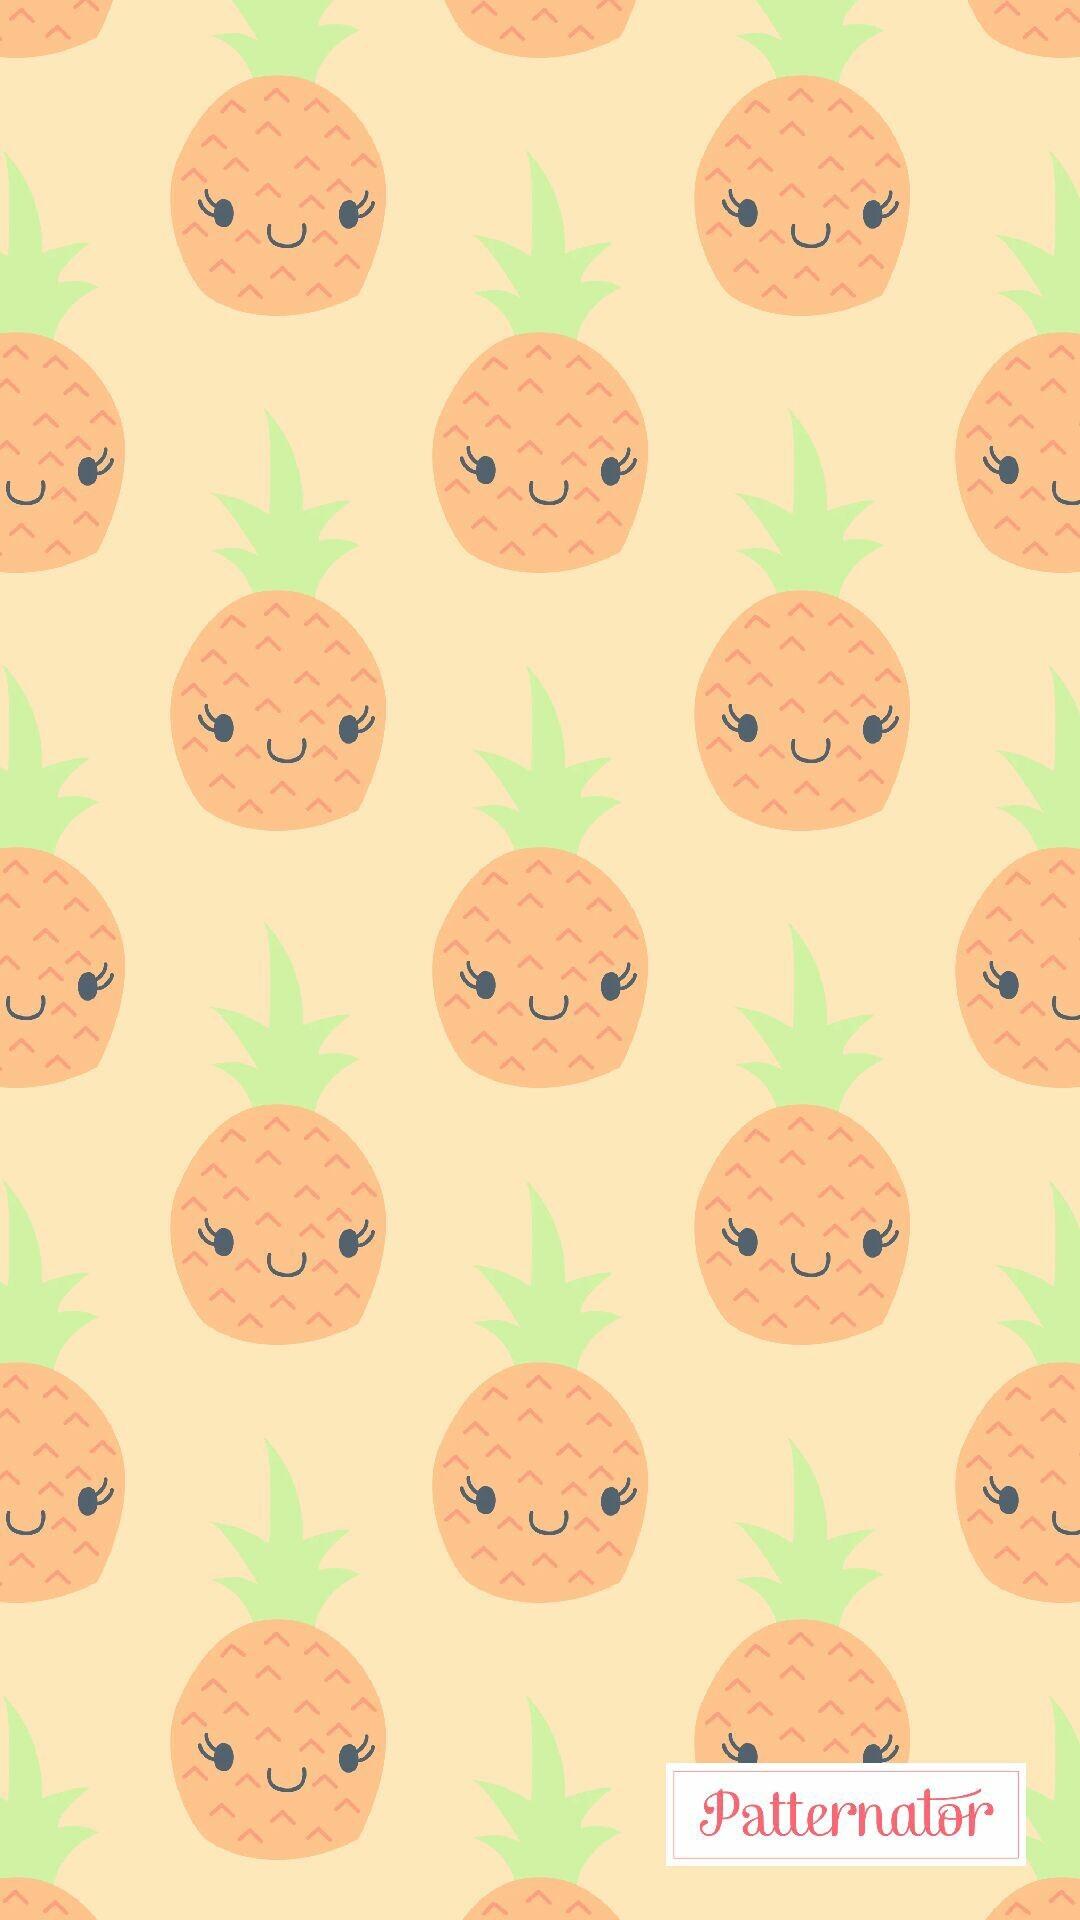 Res: 1080x1920, Phone Wallpapers, Kawaii, Food, Wallpapers, Kawaii Cute, Wallpaper For  Phone, Phone Backgrounds, Cellphone Wallpaper